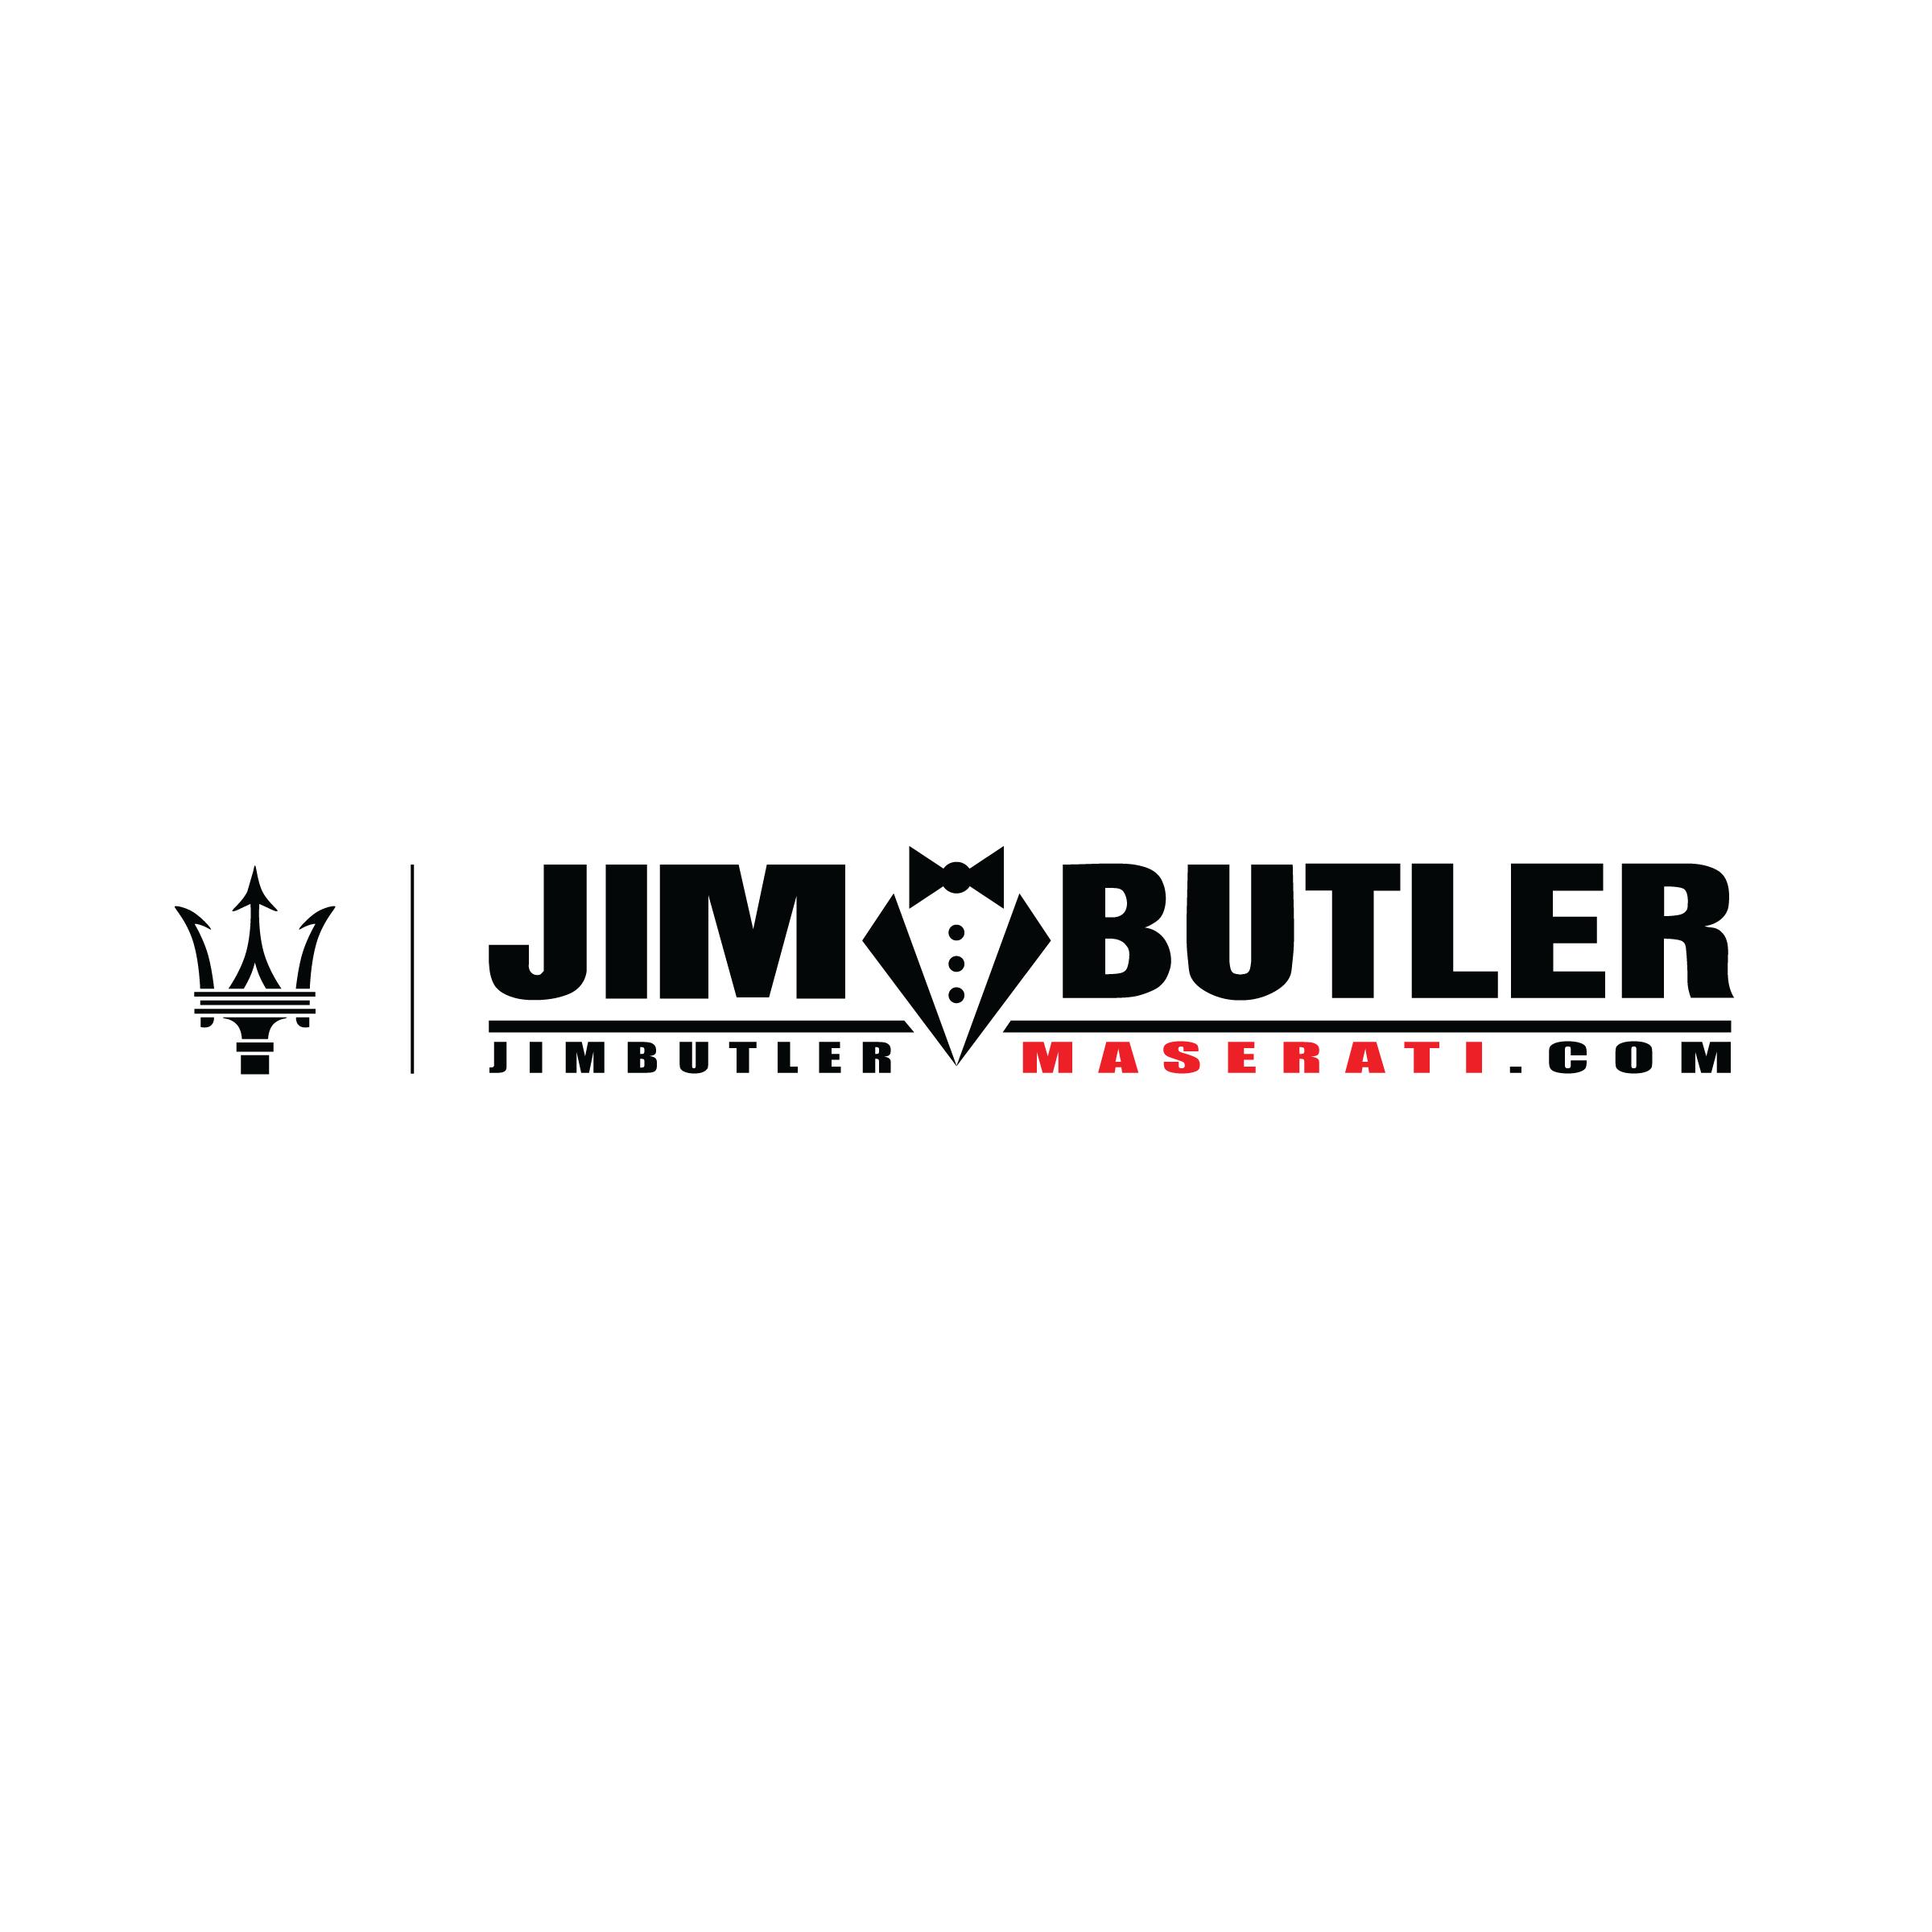 Jim Butler Maserati